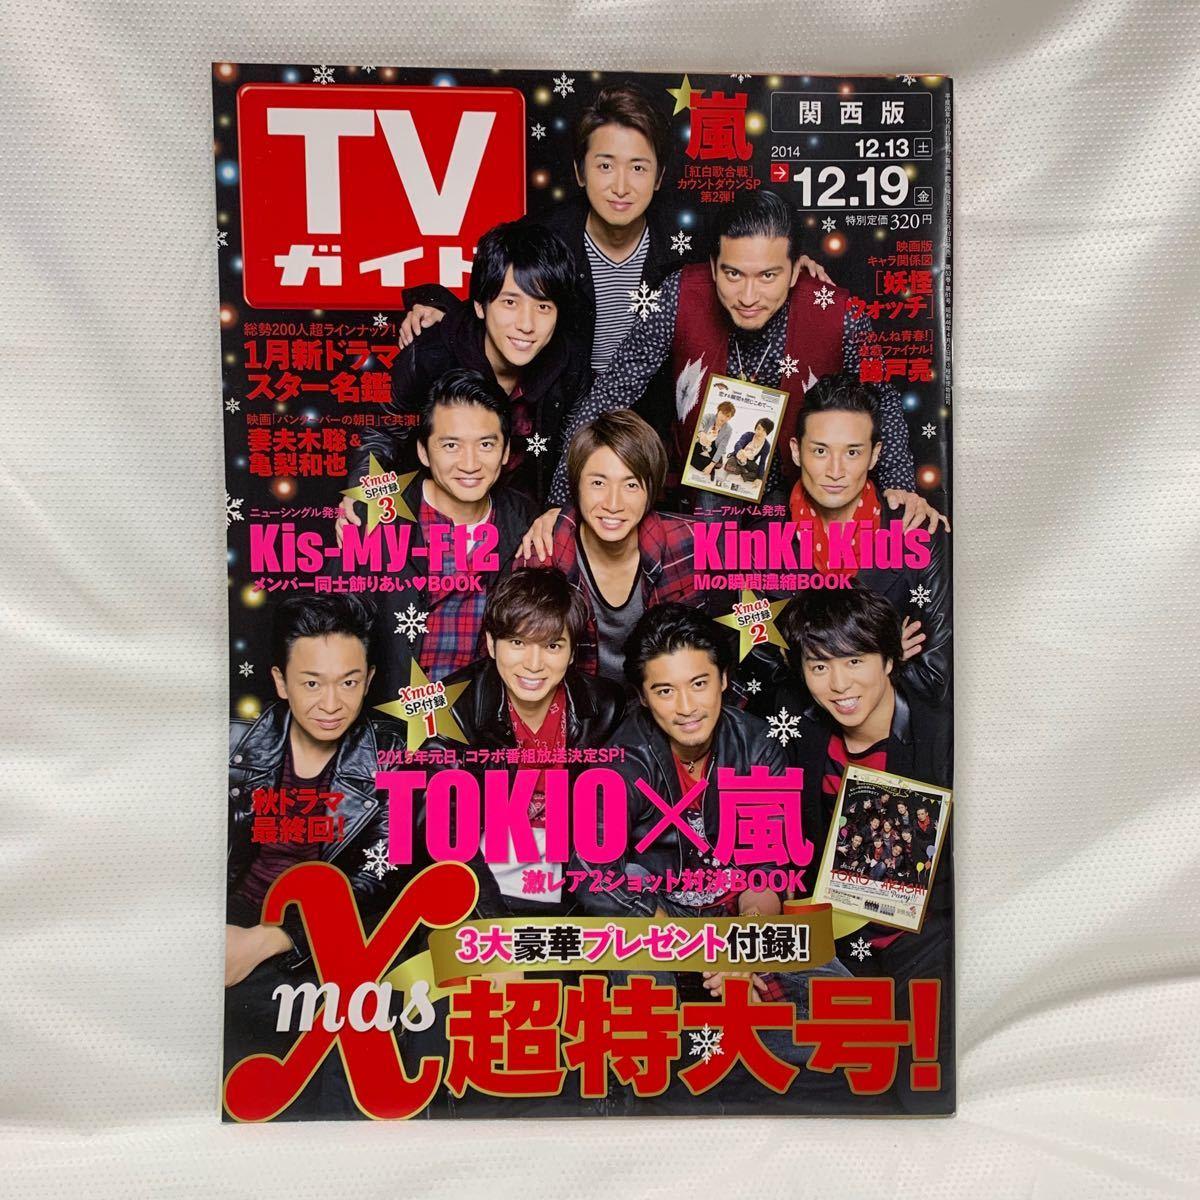 TVガイド関西版 2014.12.13-12.19